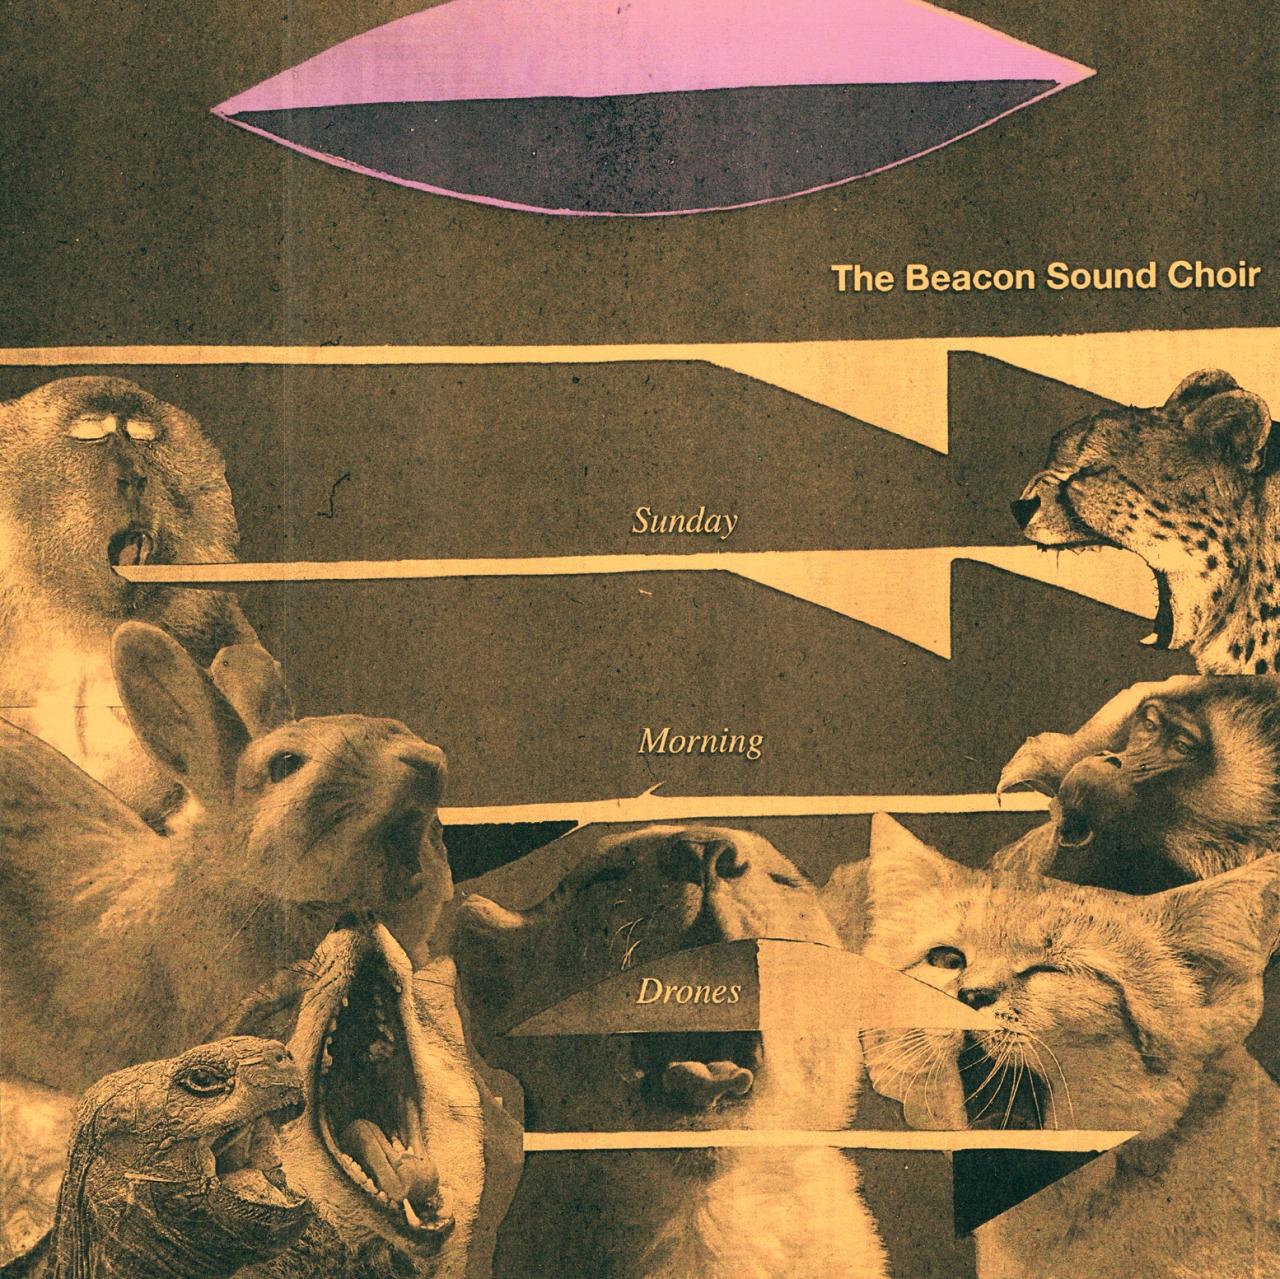 The Beacon Sound Choir ~ Sunday MorningDrones